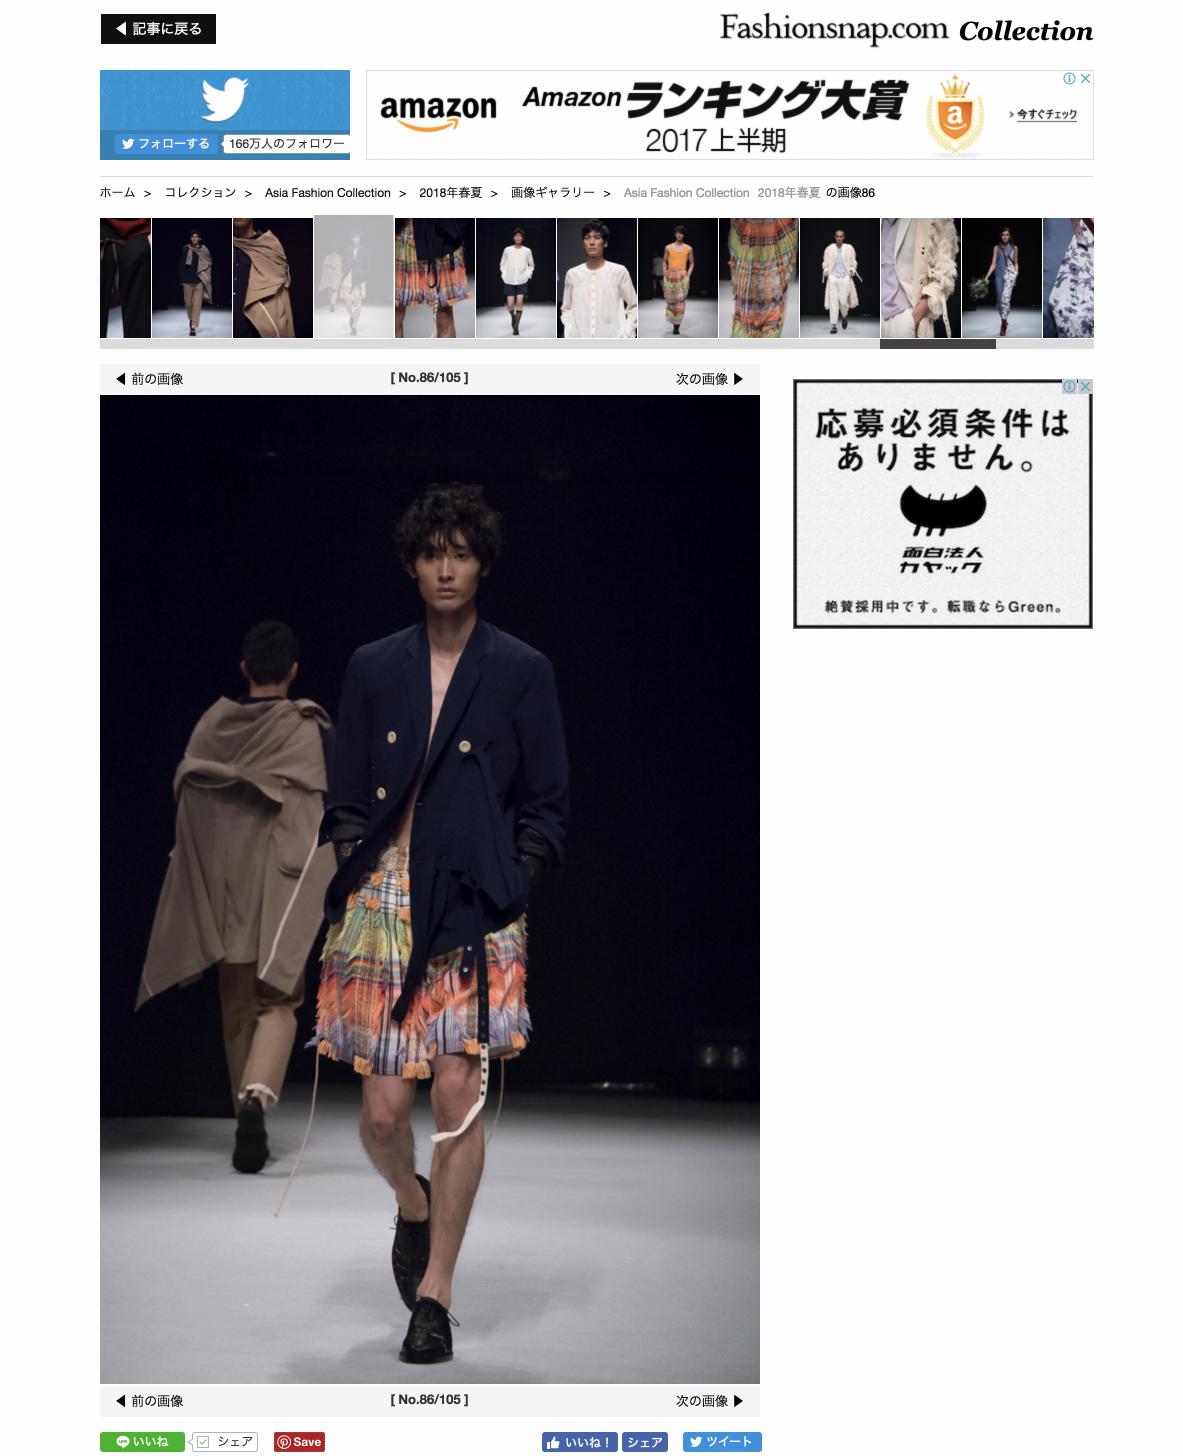 Spring/summer 2018 runway on Fashionsnap